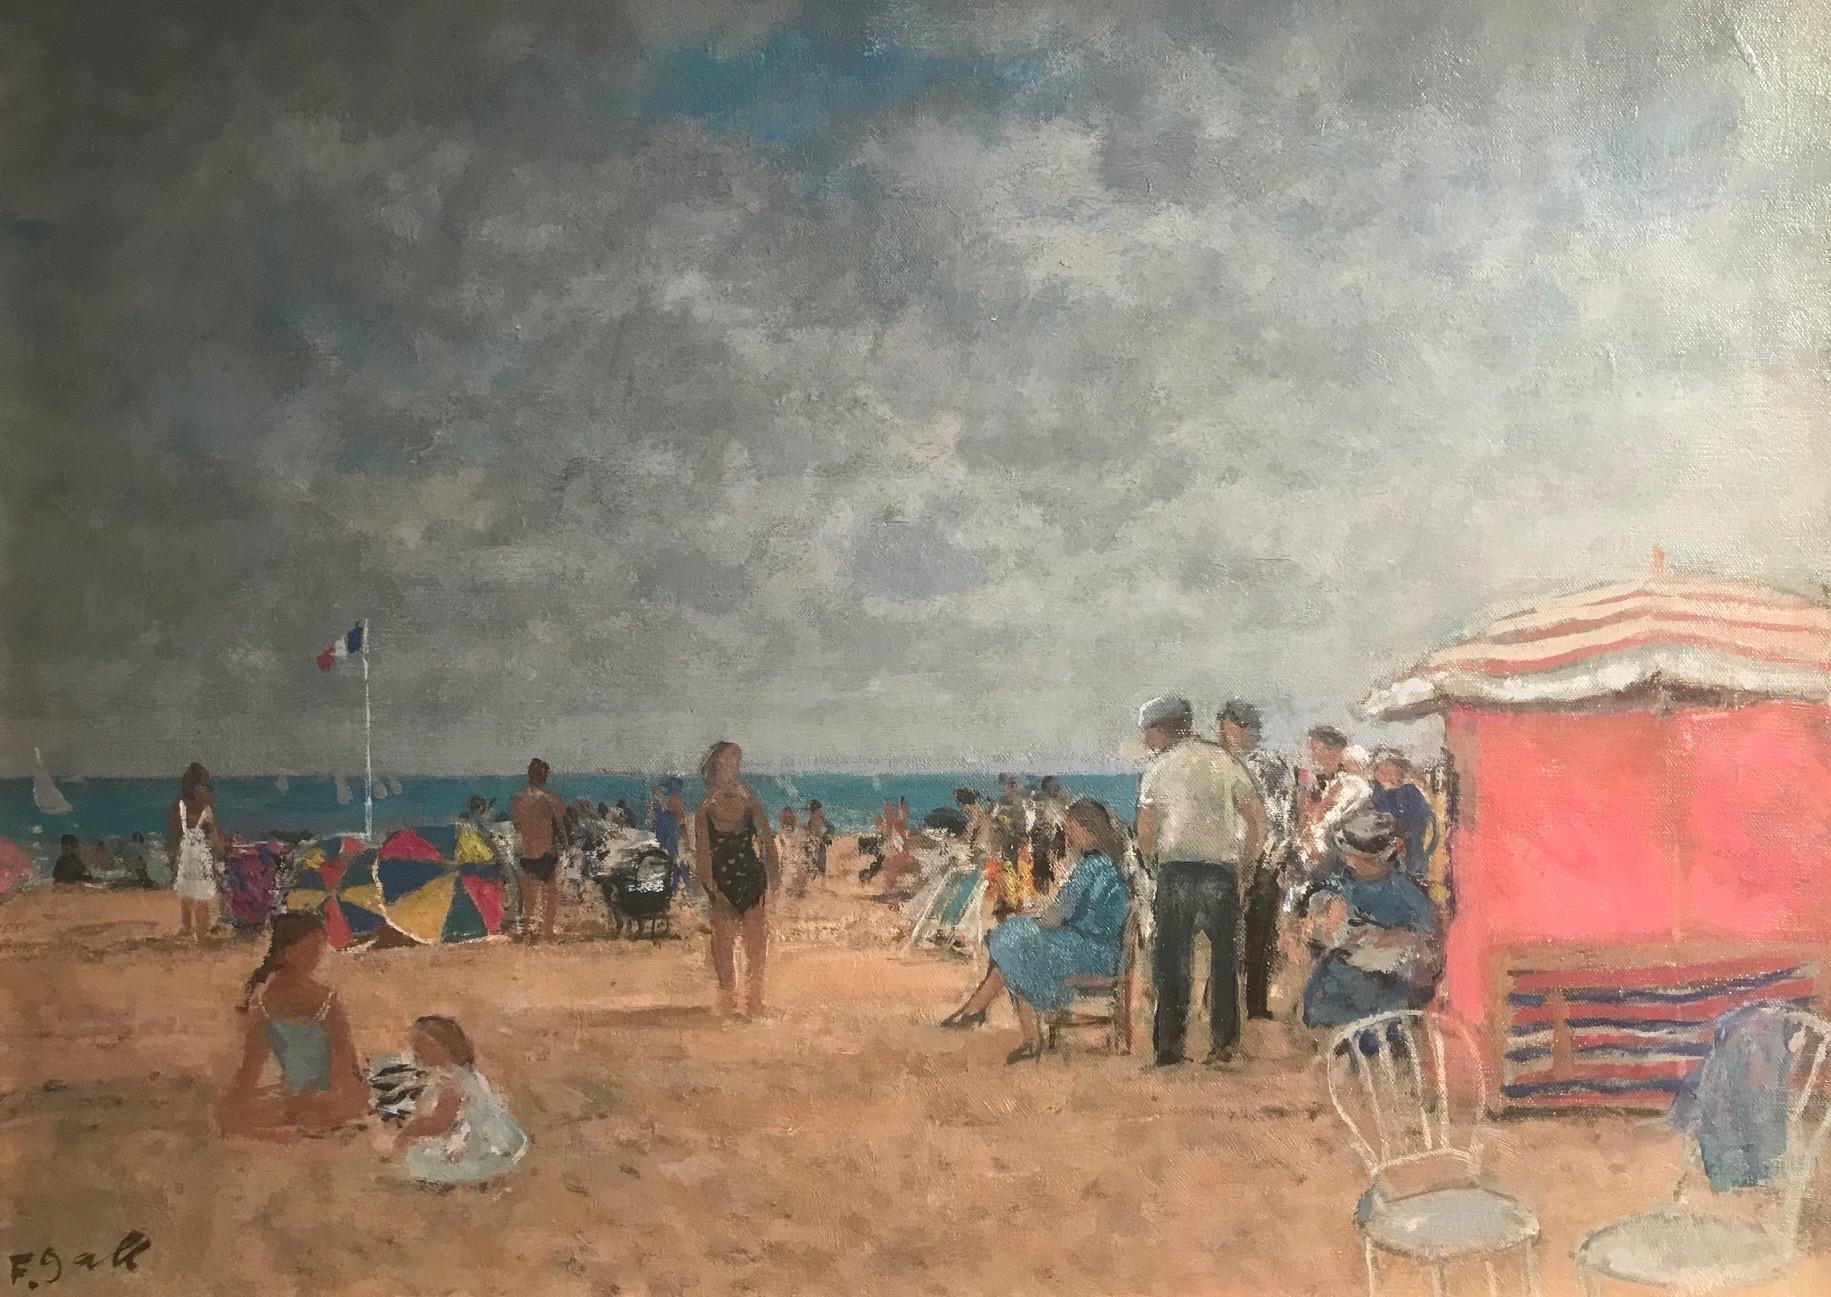 Bright Normandy Beach Scene with Figures, Sea & Boats 'Un Plage,Normandie'.